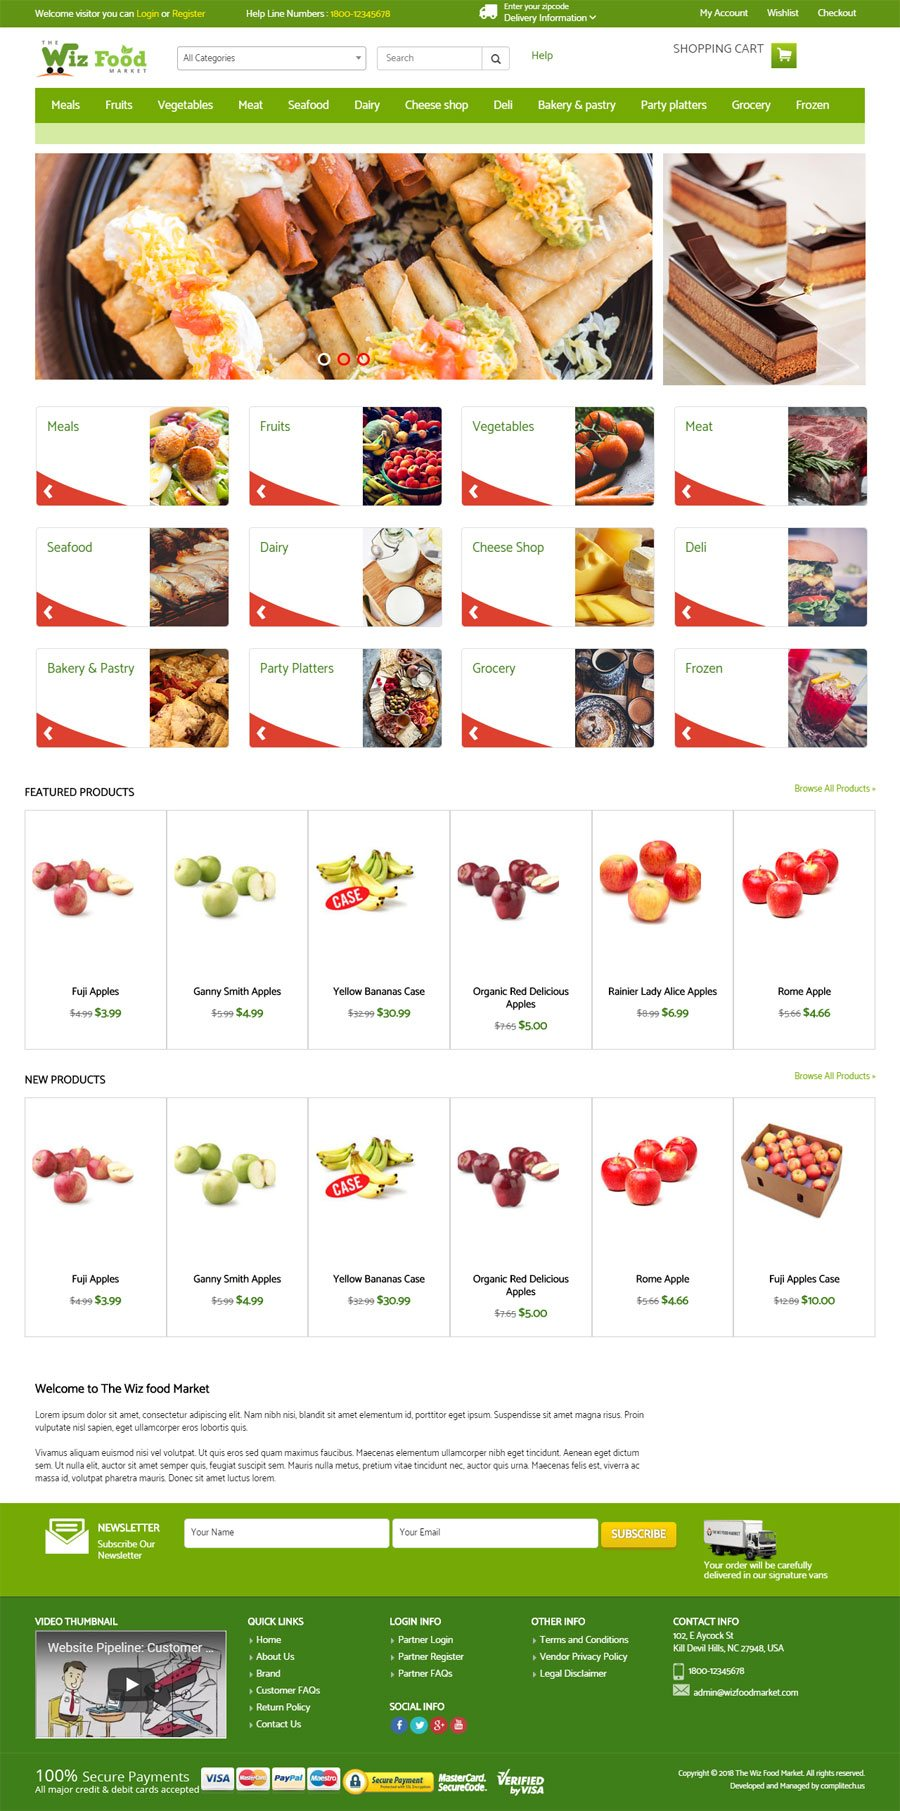 Wiz Food Market India Web Design